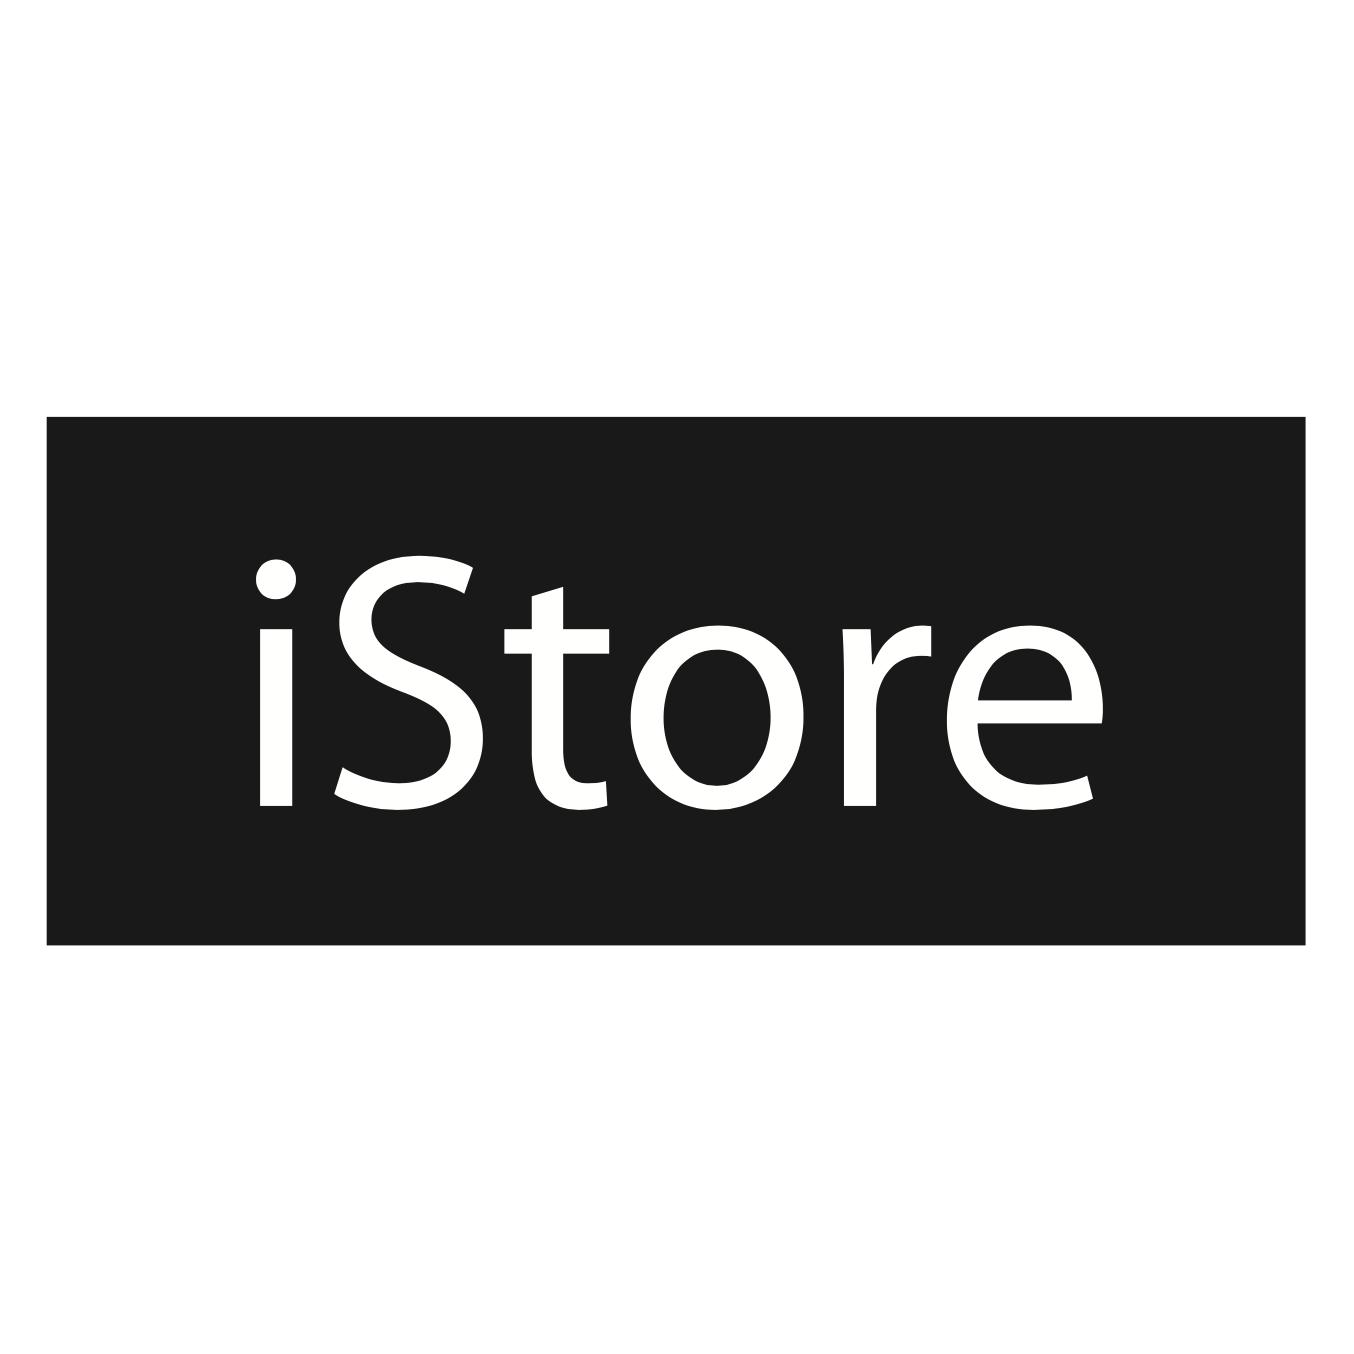 iPhone 7 Silicone Case - Cocoa